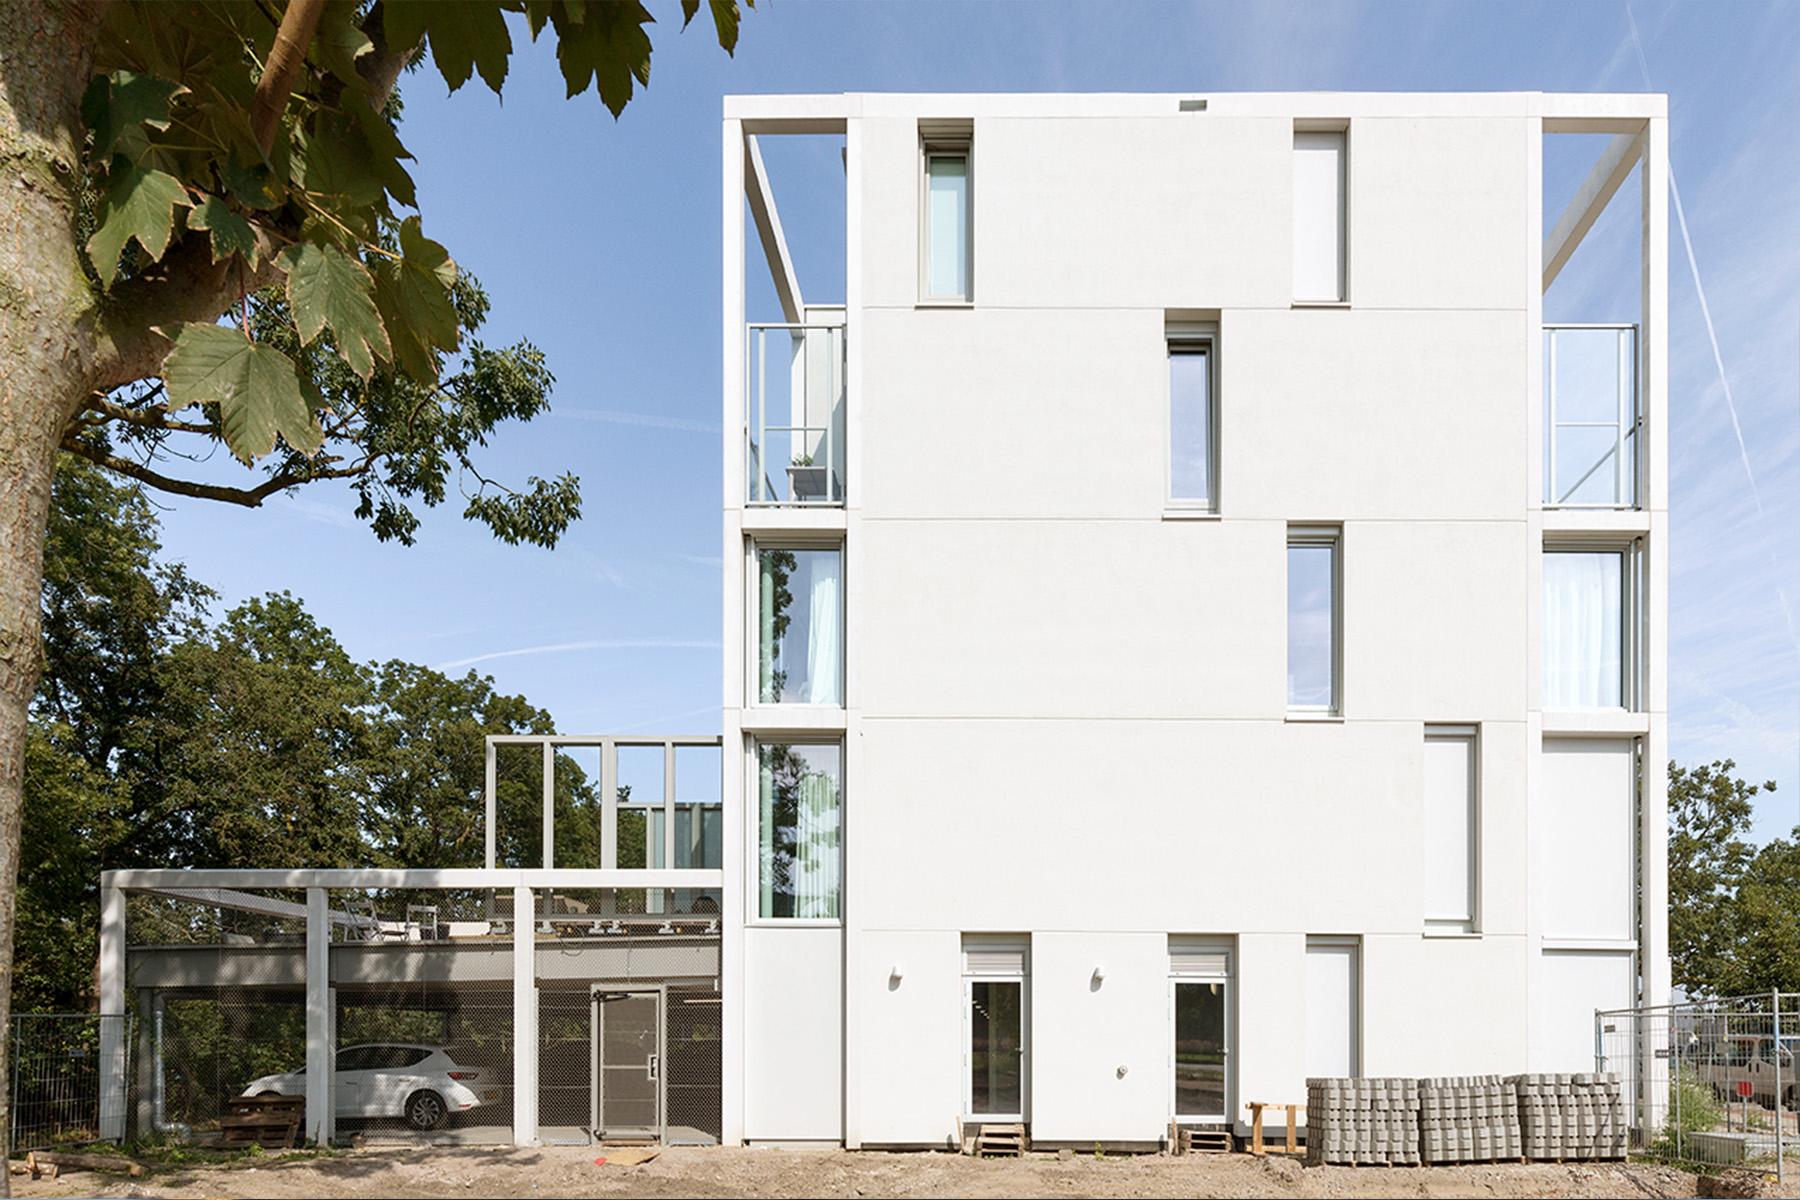 <p>Superlofts Blok Y. Foto: Stijn Poelstra</p>